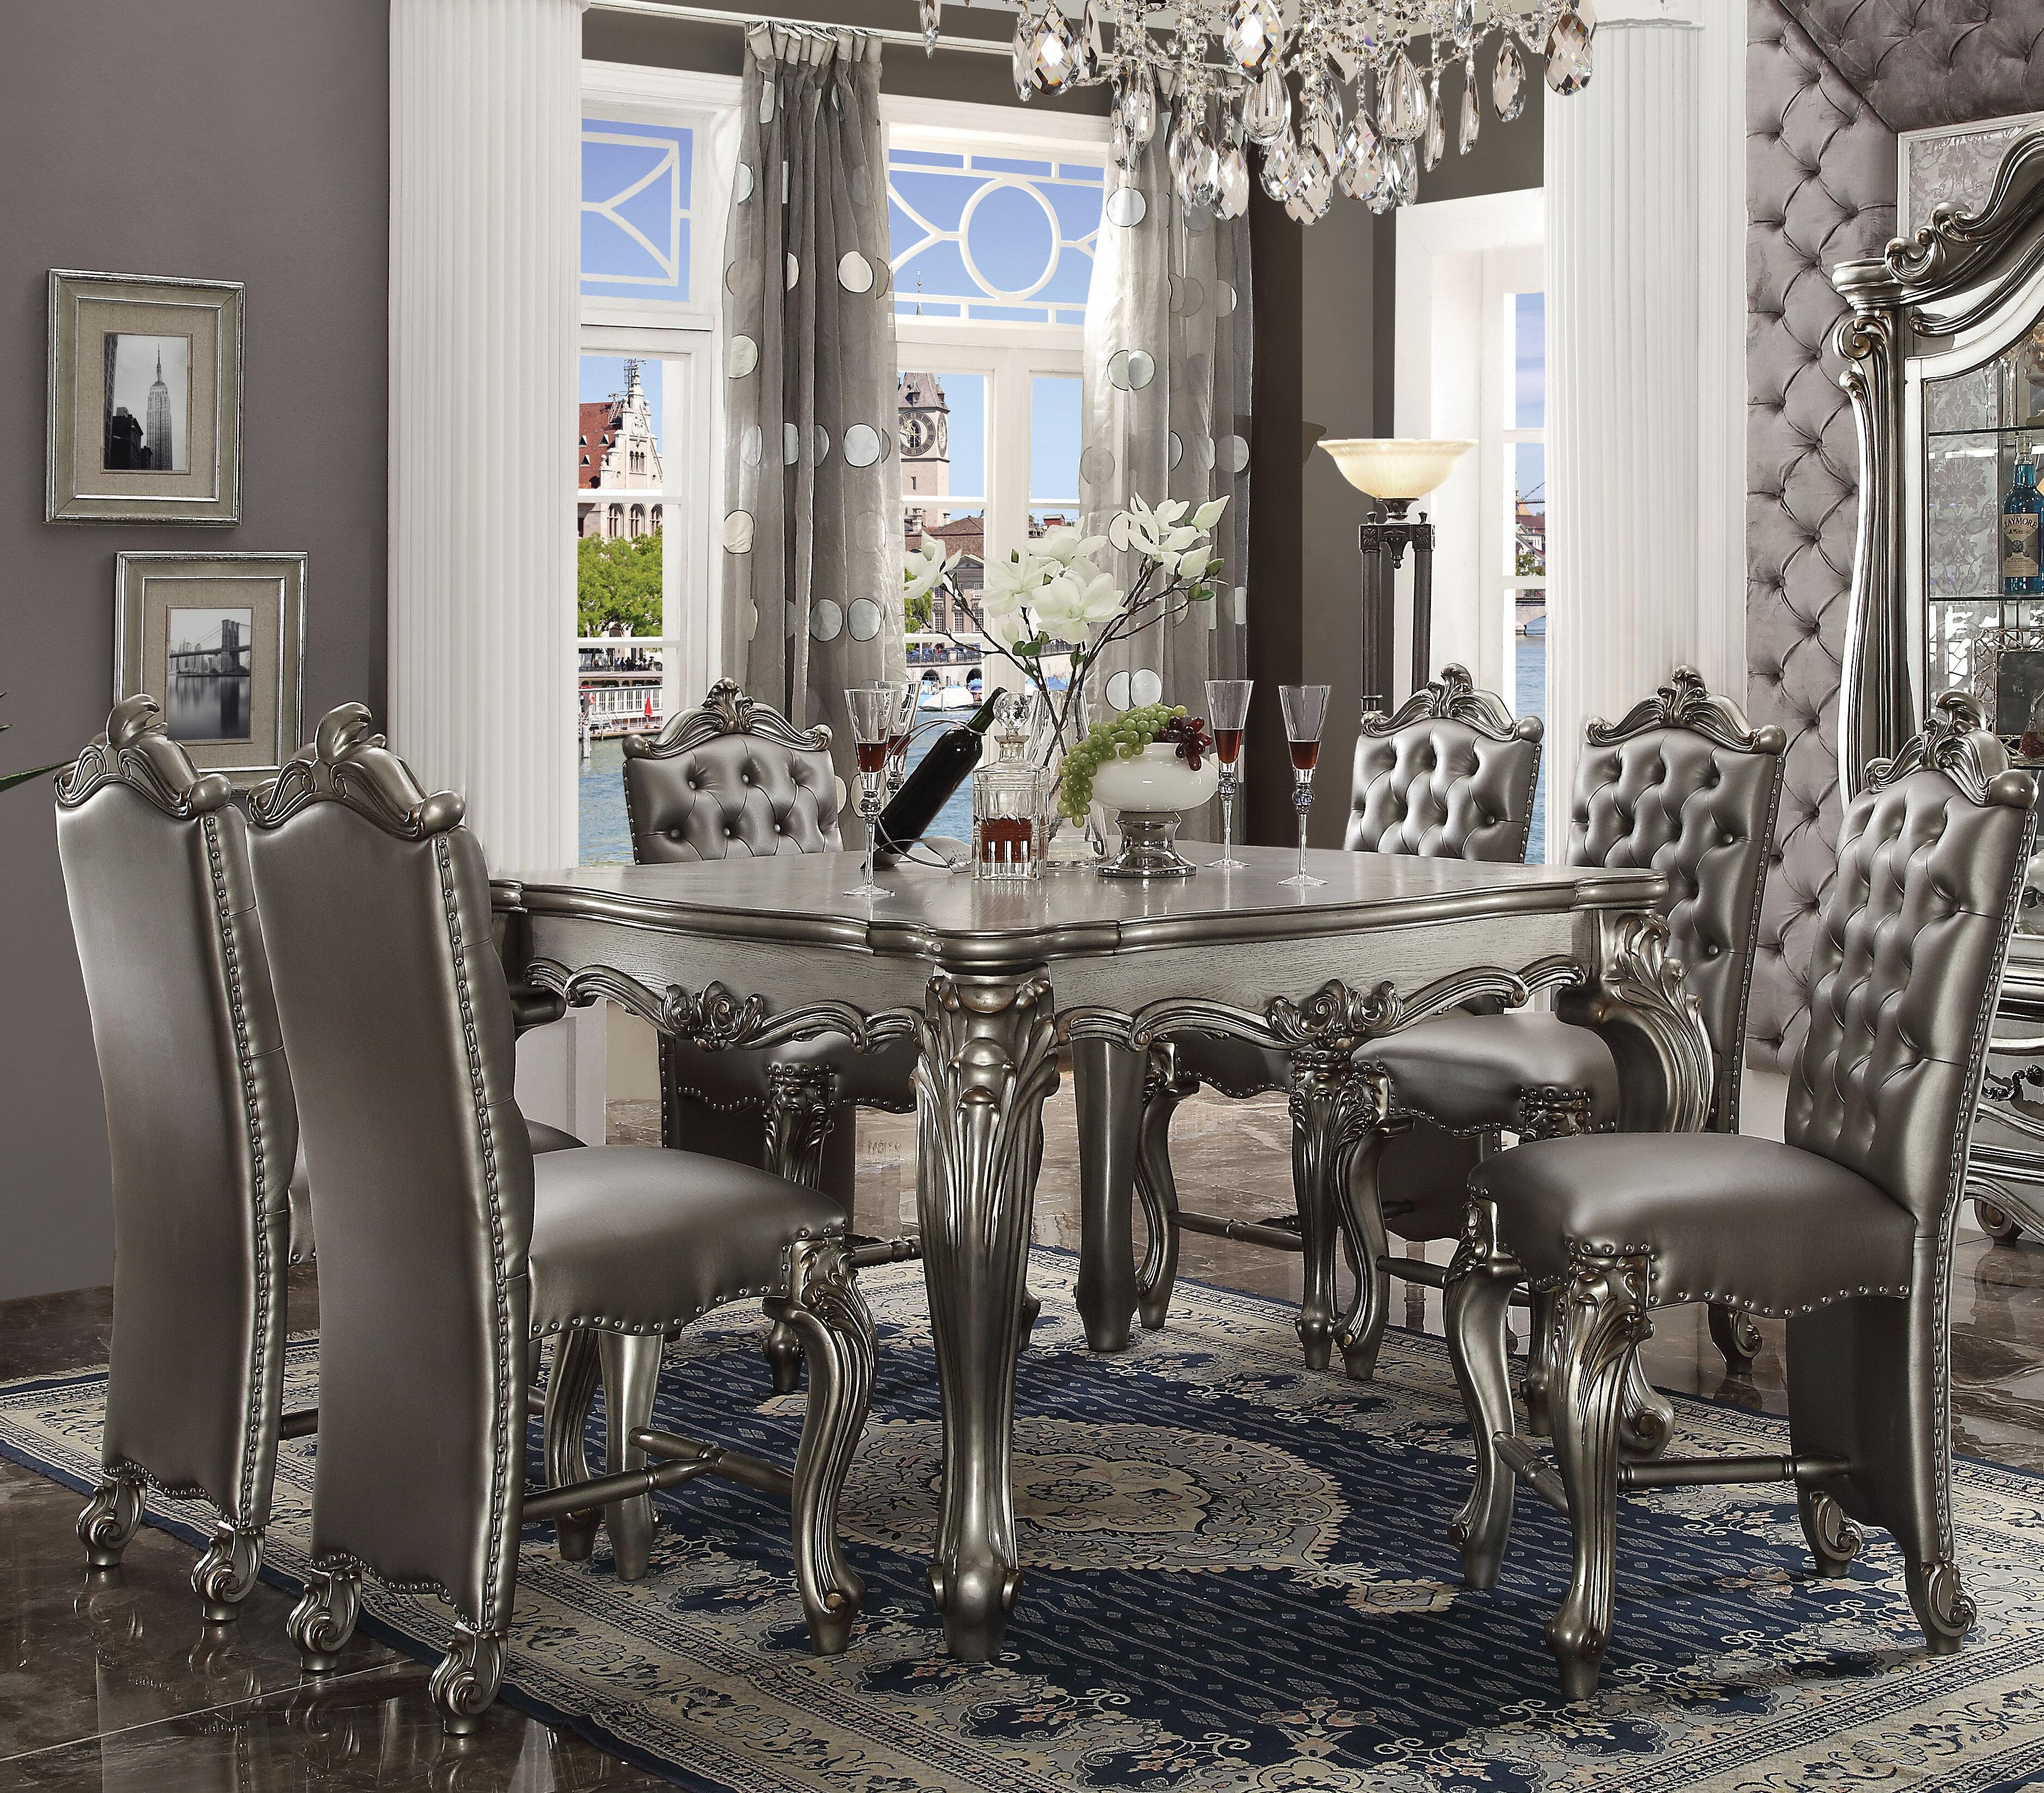 White Cane Outdoor Furniture, Astoria Grand Welton 7 Piece Counter Height Dining Set Reviews Wayfair